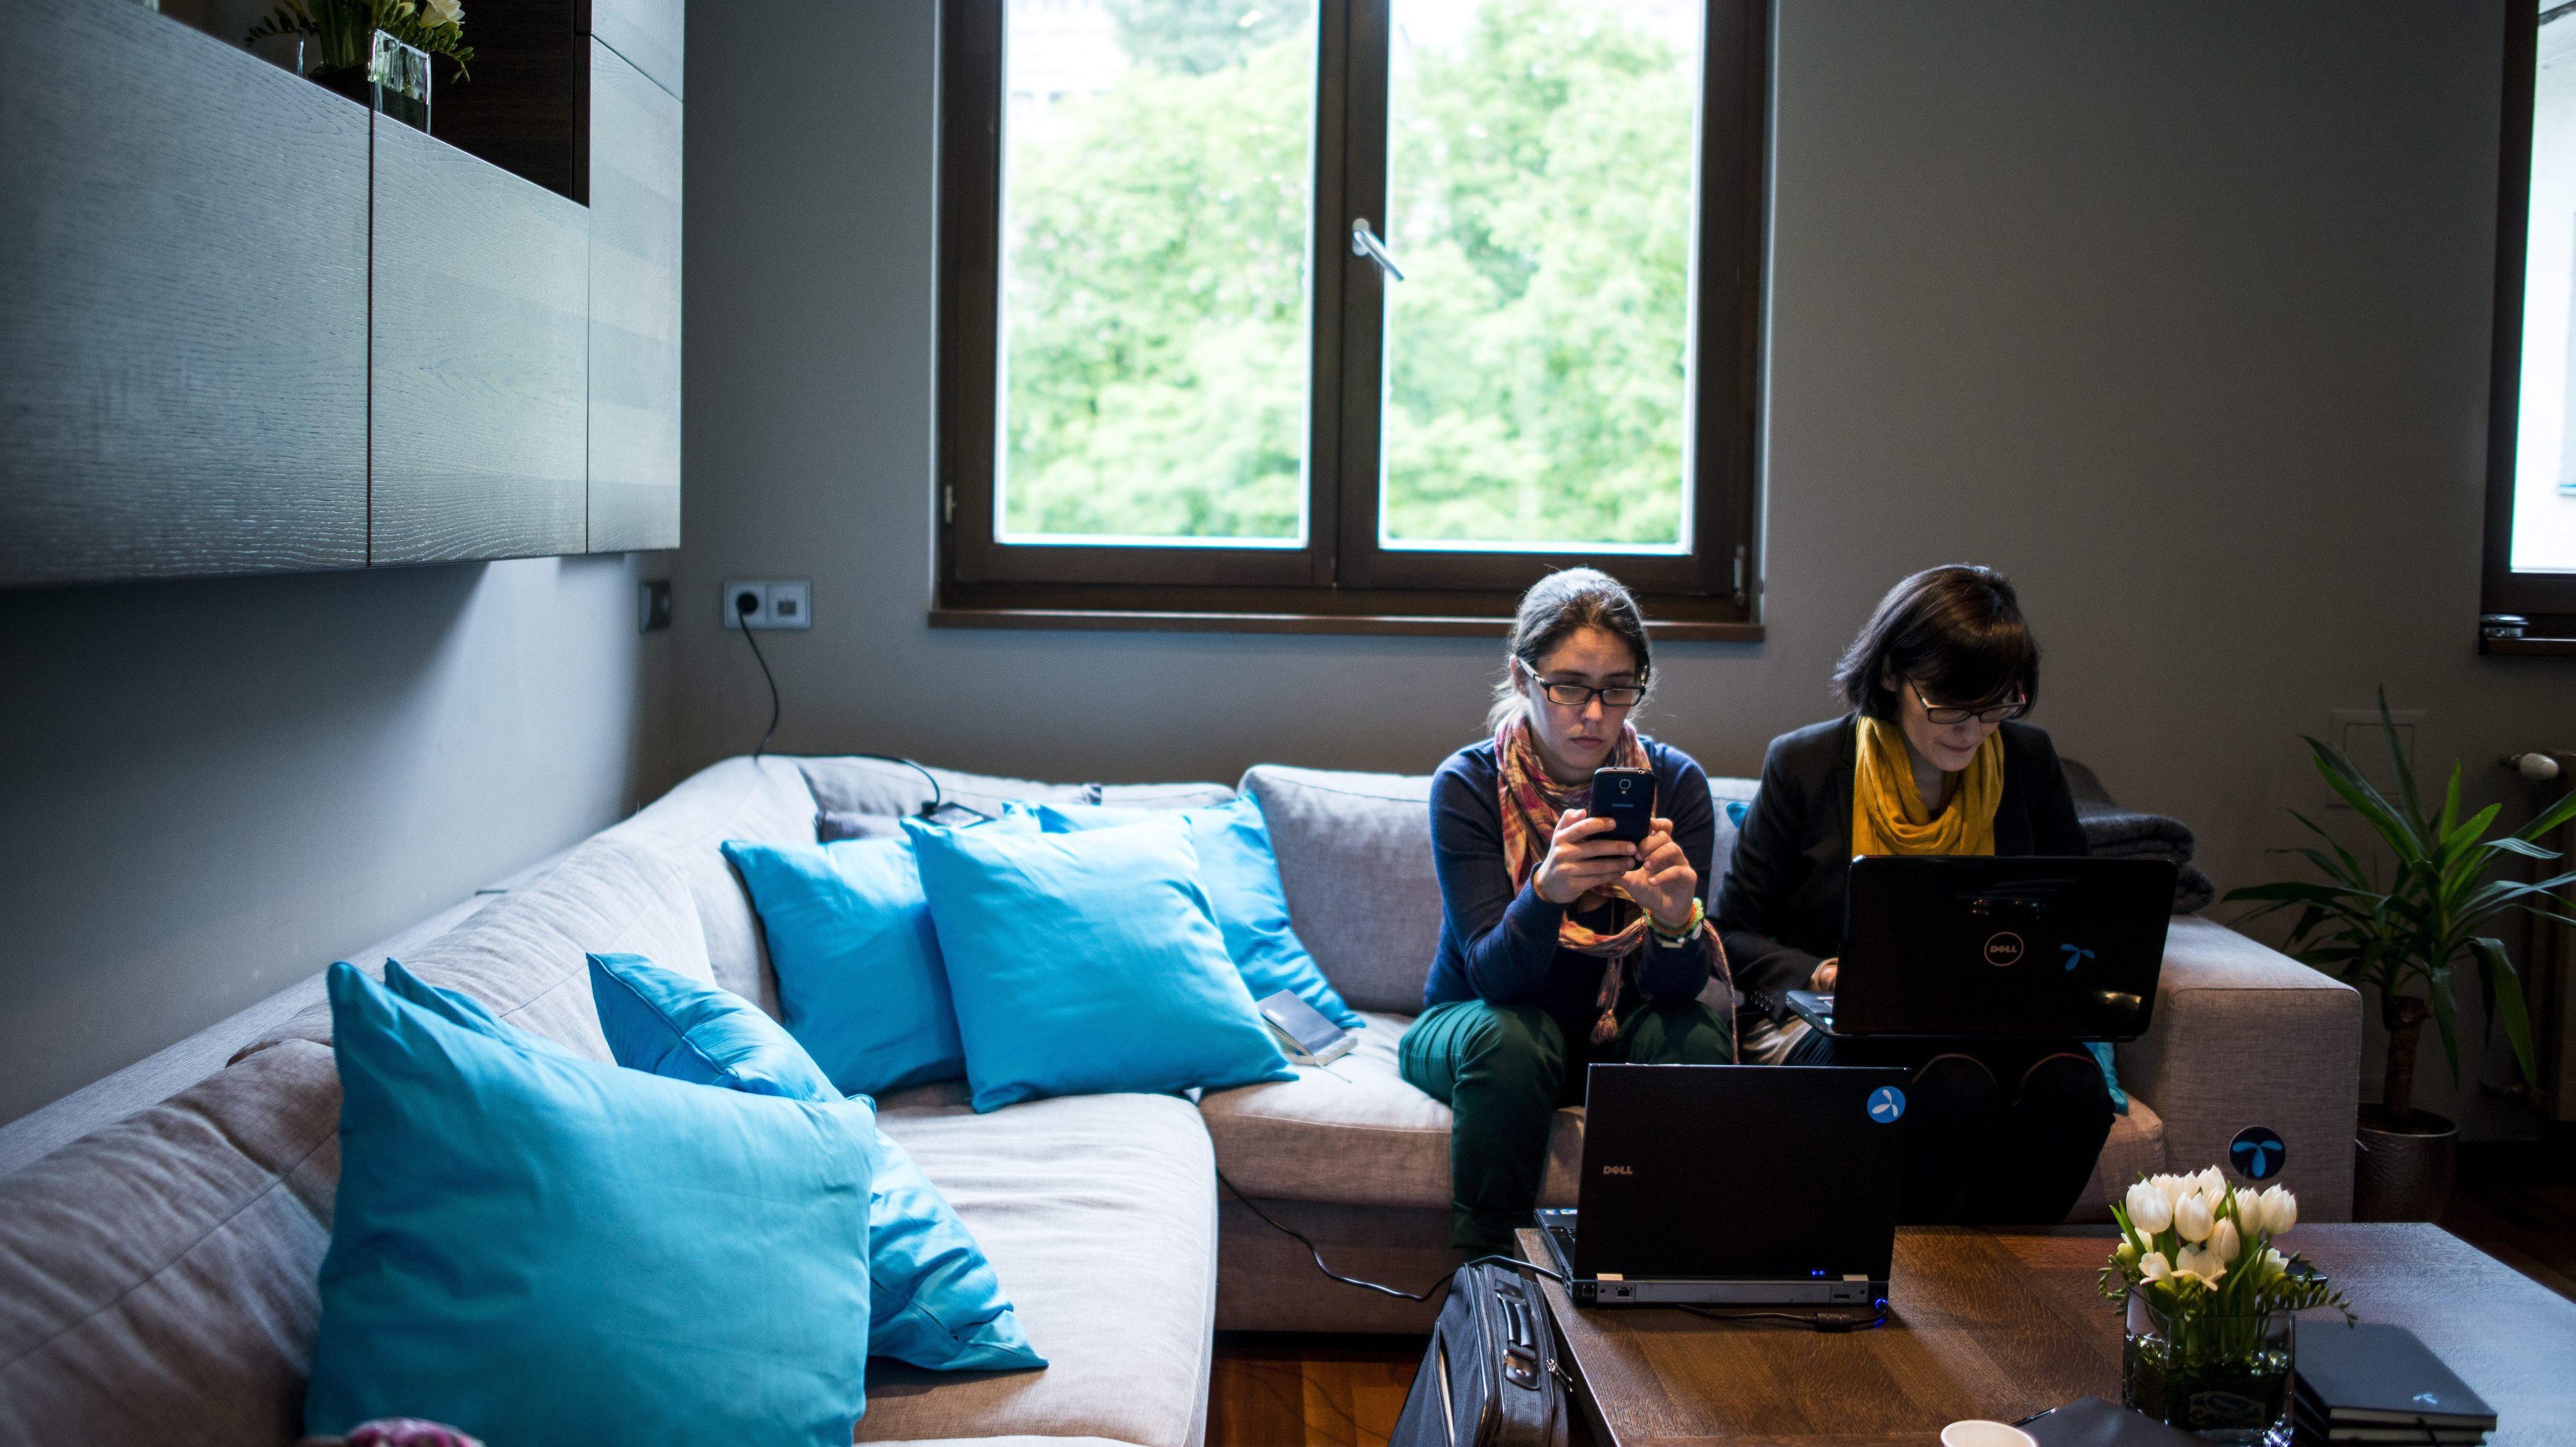 otthoni munka összesítése 2021 bináris opciók demo platformok